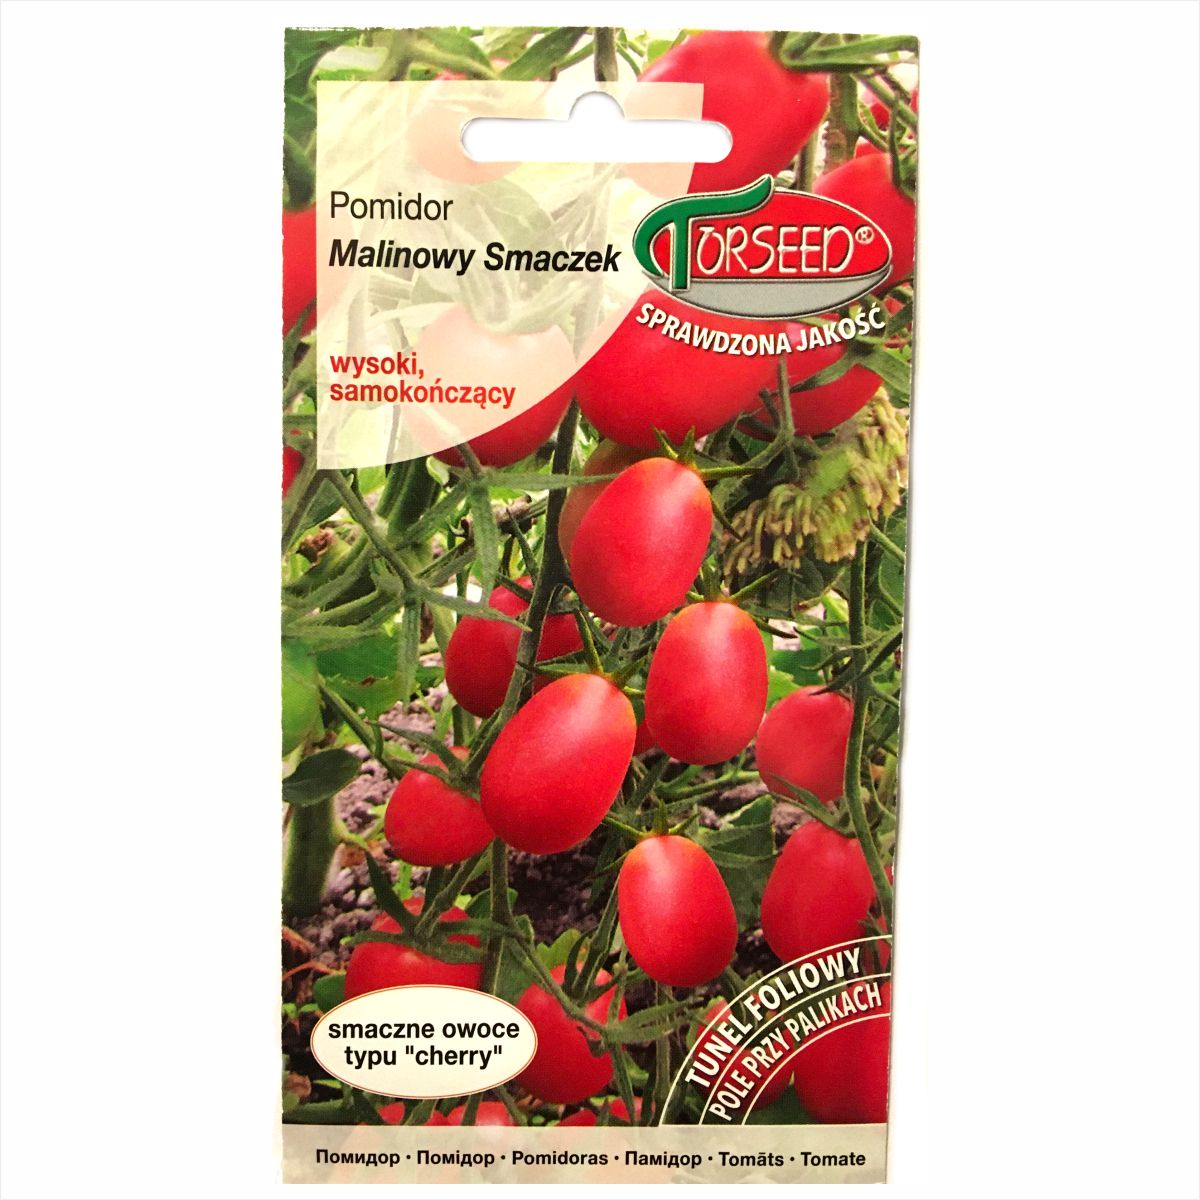 Pomidor Malinowy Smaczek nasiona Torseed